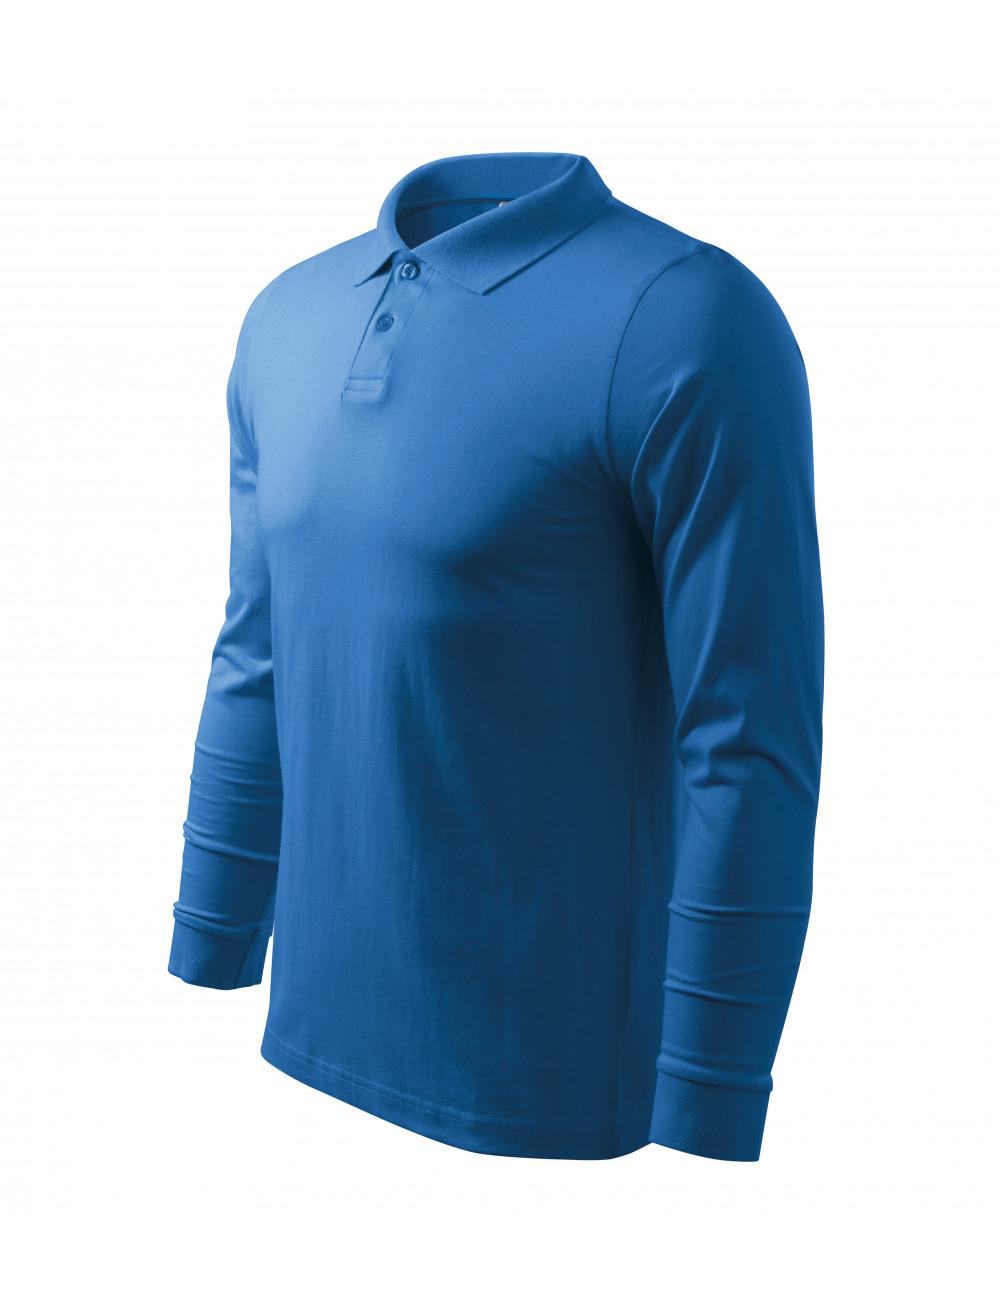 Adler MALFINI Koszulka polo męska Single J. LS 211 lazurowy